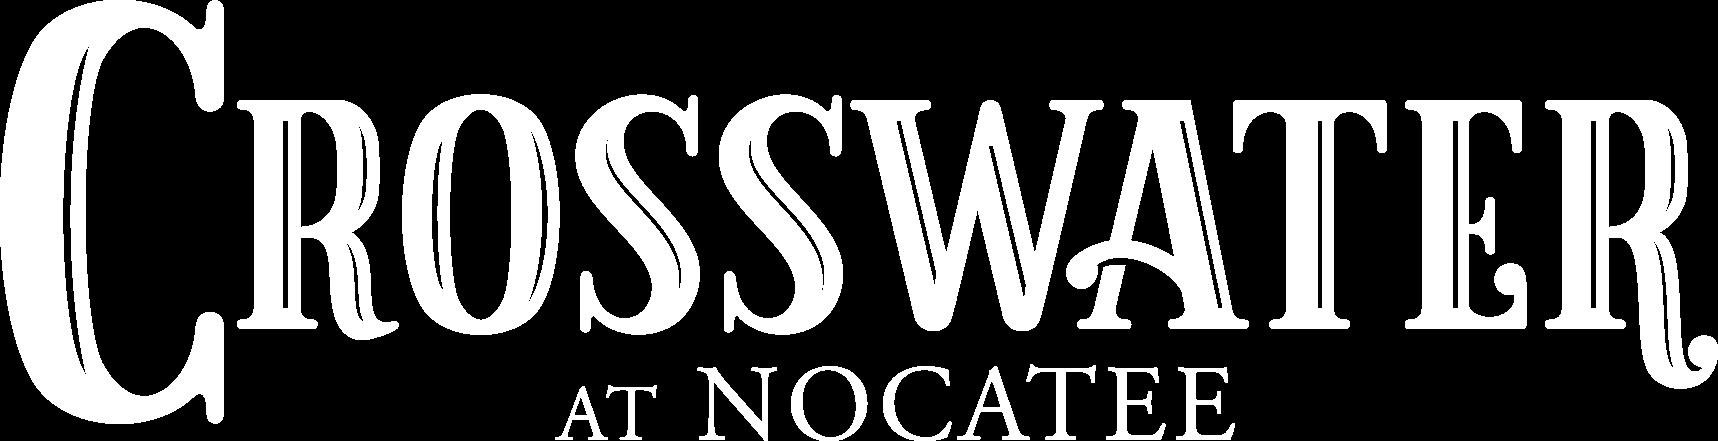 Crosswater at Nocatee Logo_white.png